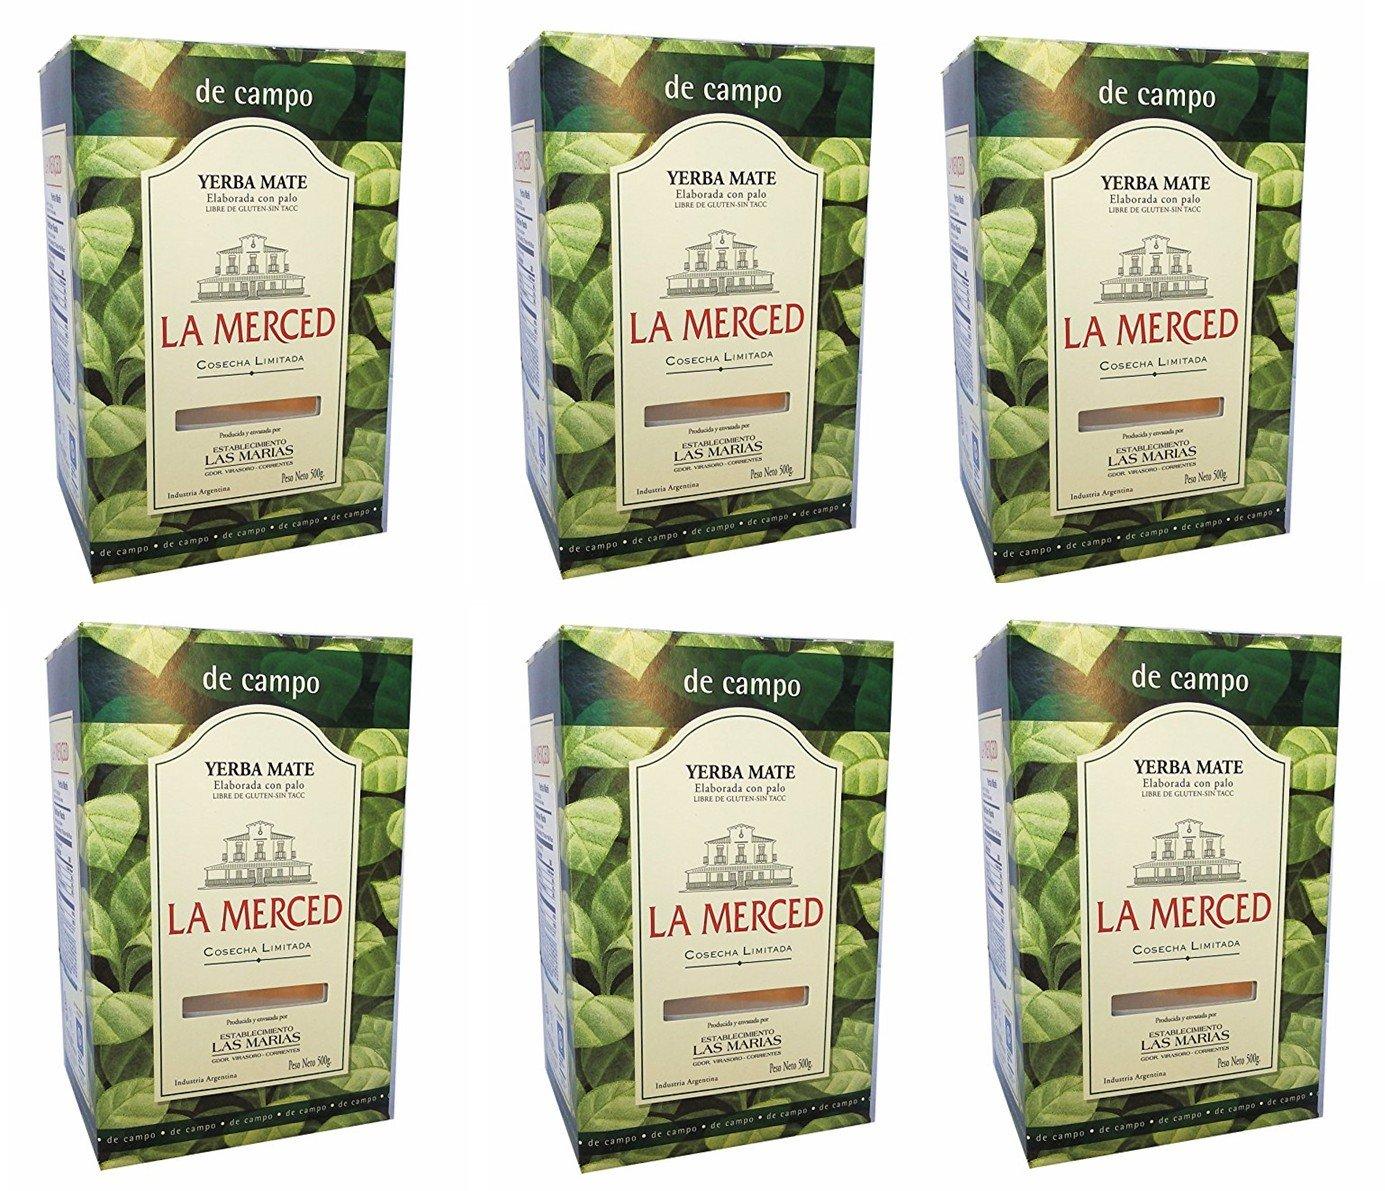 La Merced De Campo Yerba Mate 500 g (1.1 lbs) 6 Pack by La Merced (Image #1)